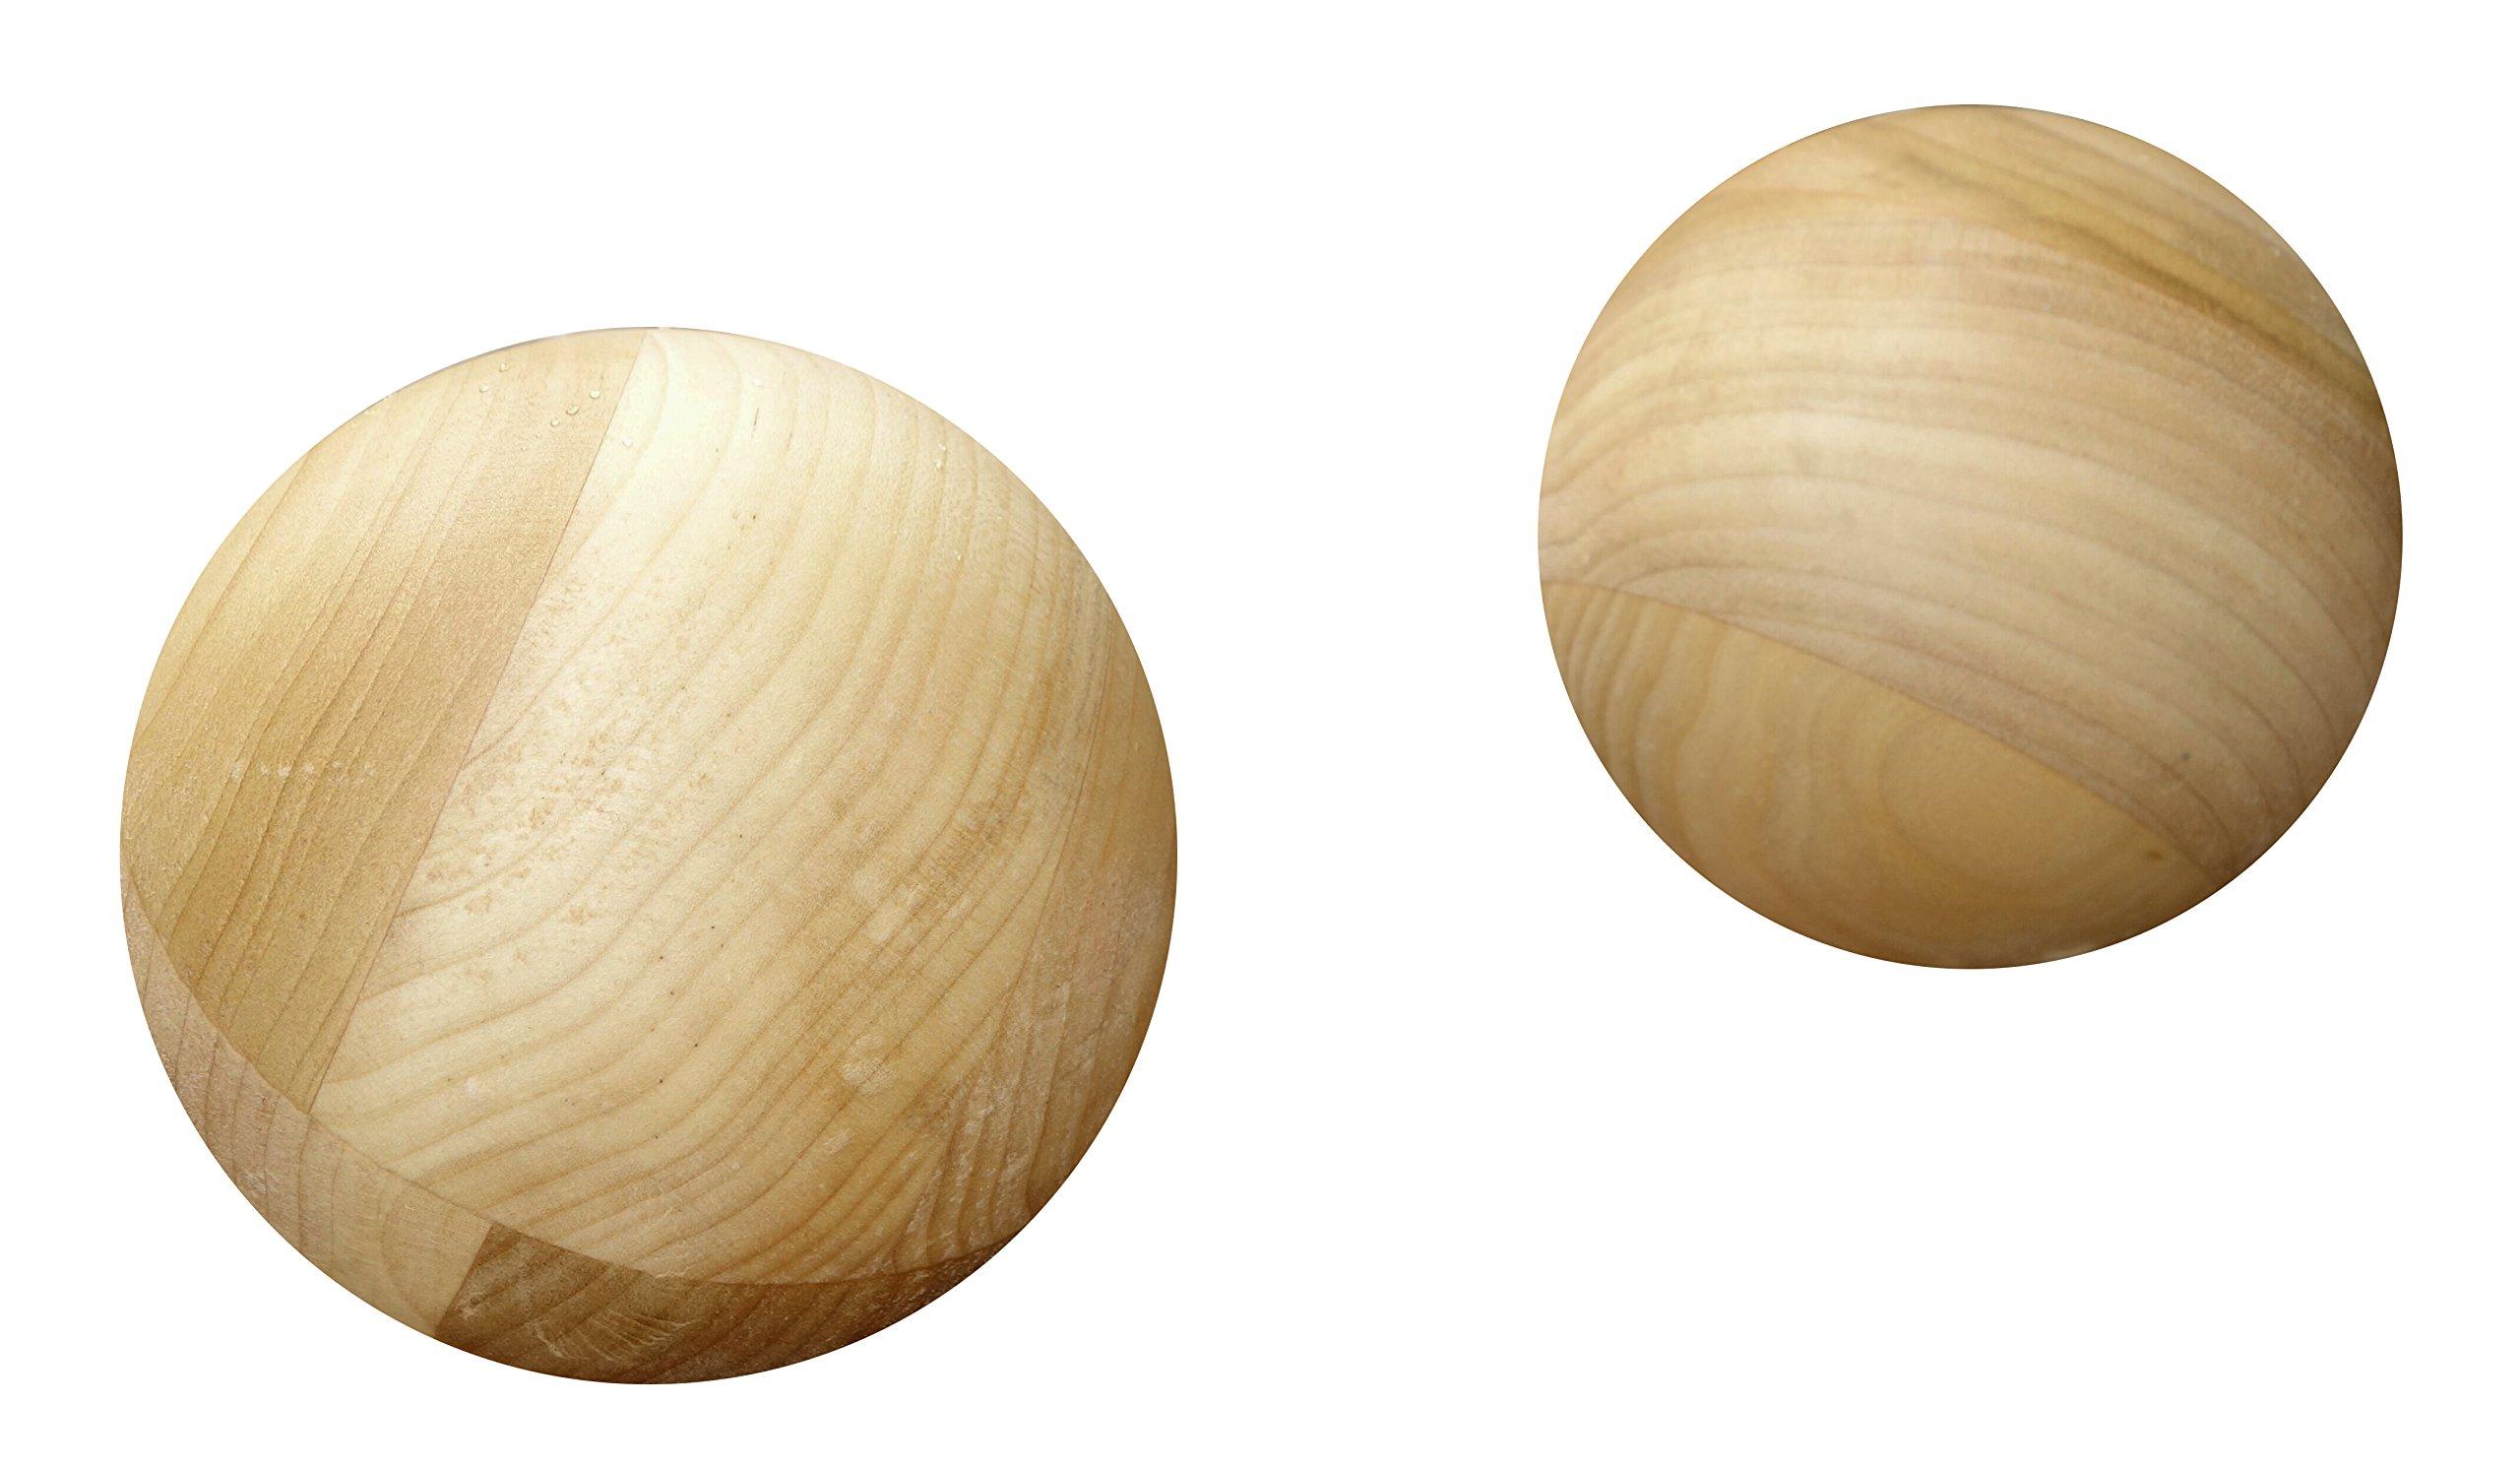 Tai Chi Ball - Starter Balls, Set of 2 (YMAA) 4'', 2-3 lbs, poplar (David-Dorian Ross Ball Workout)